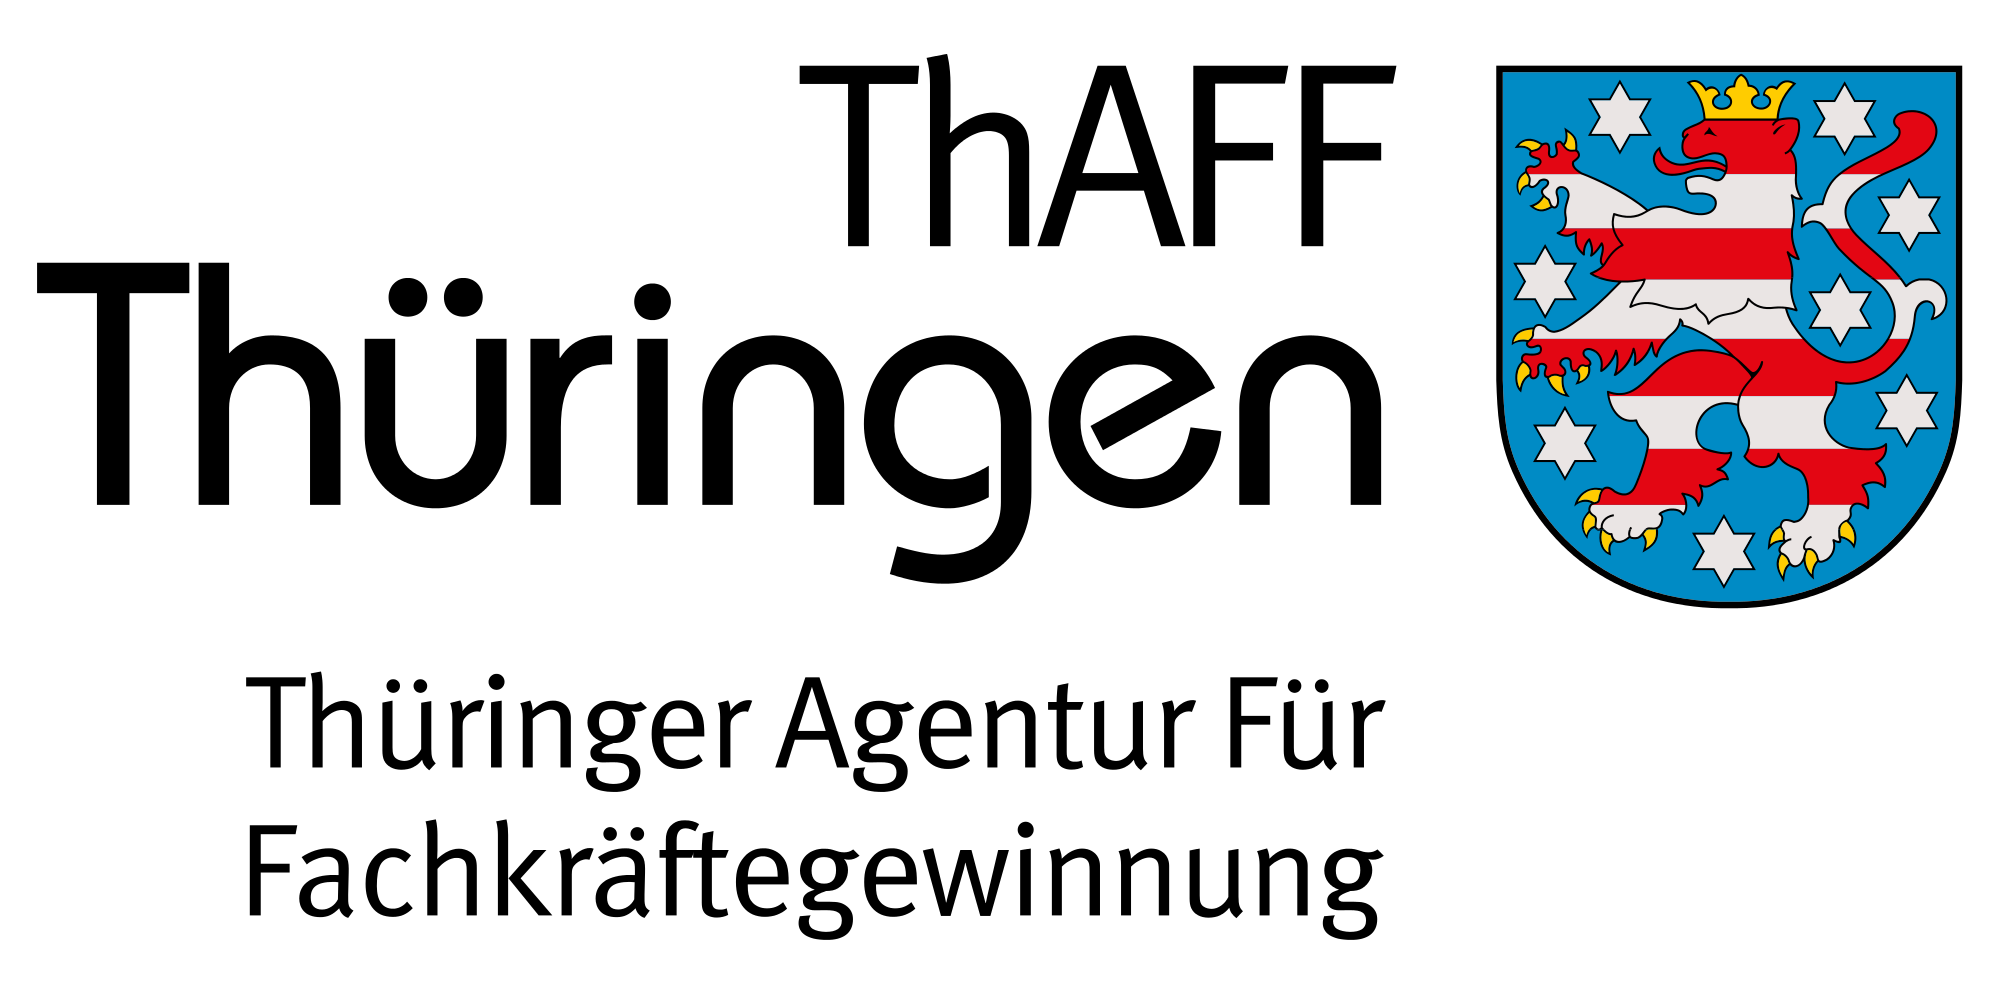 logo thaff thueringen © thaff_thüringen